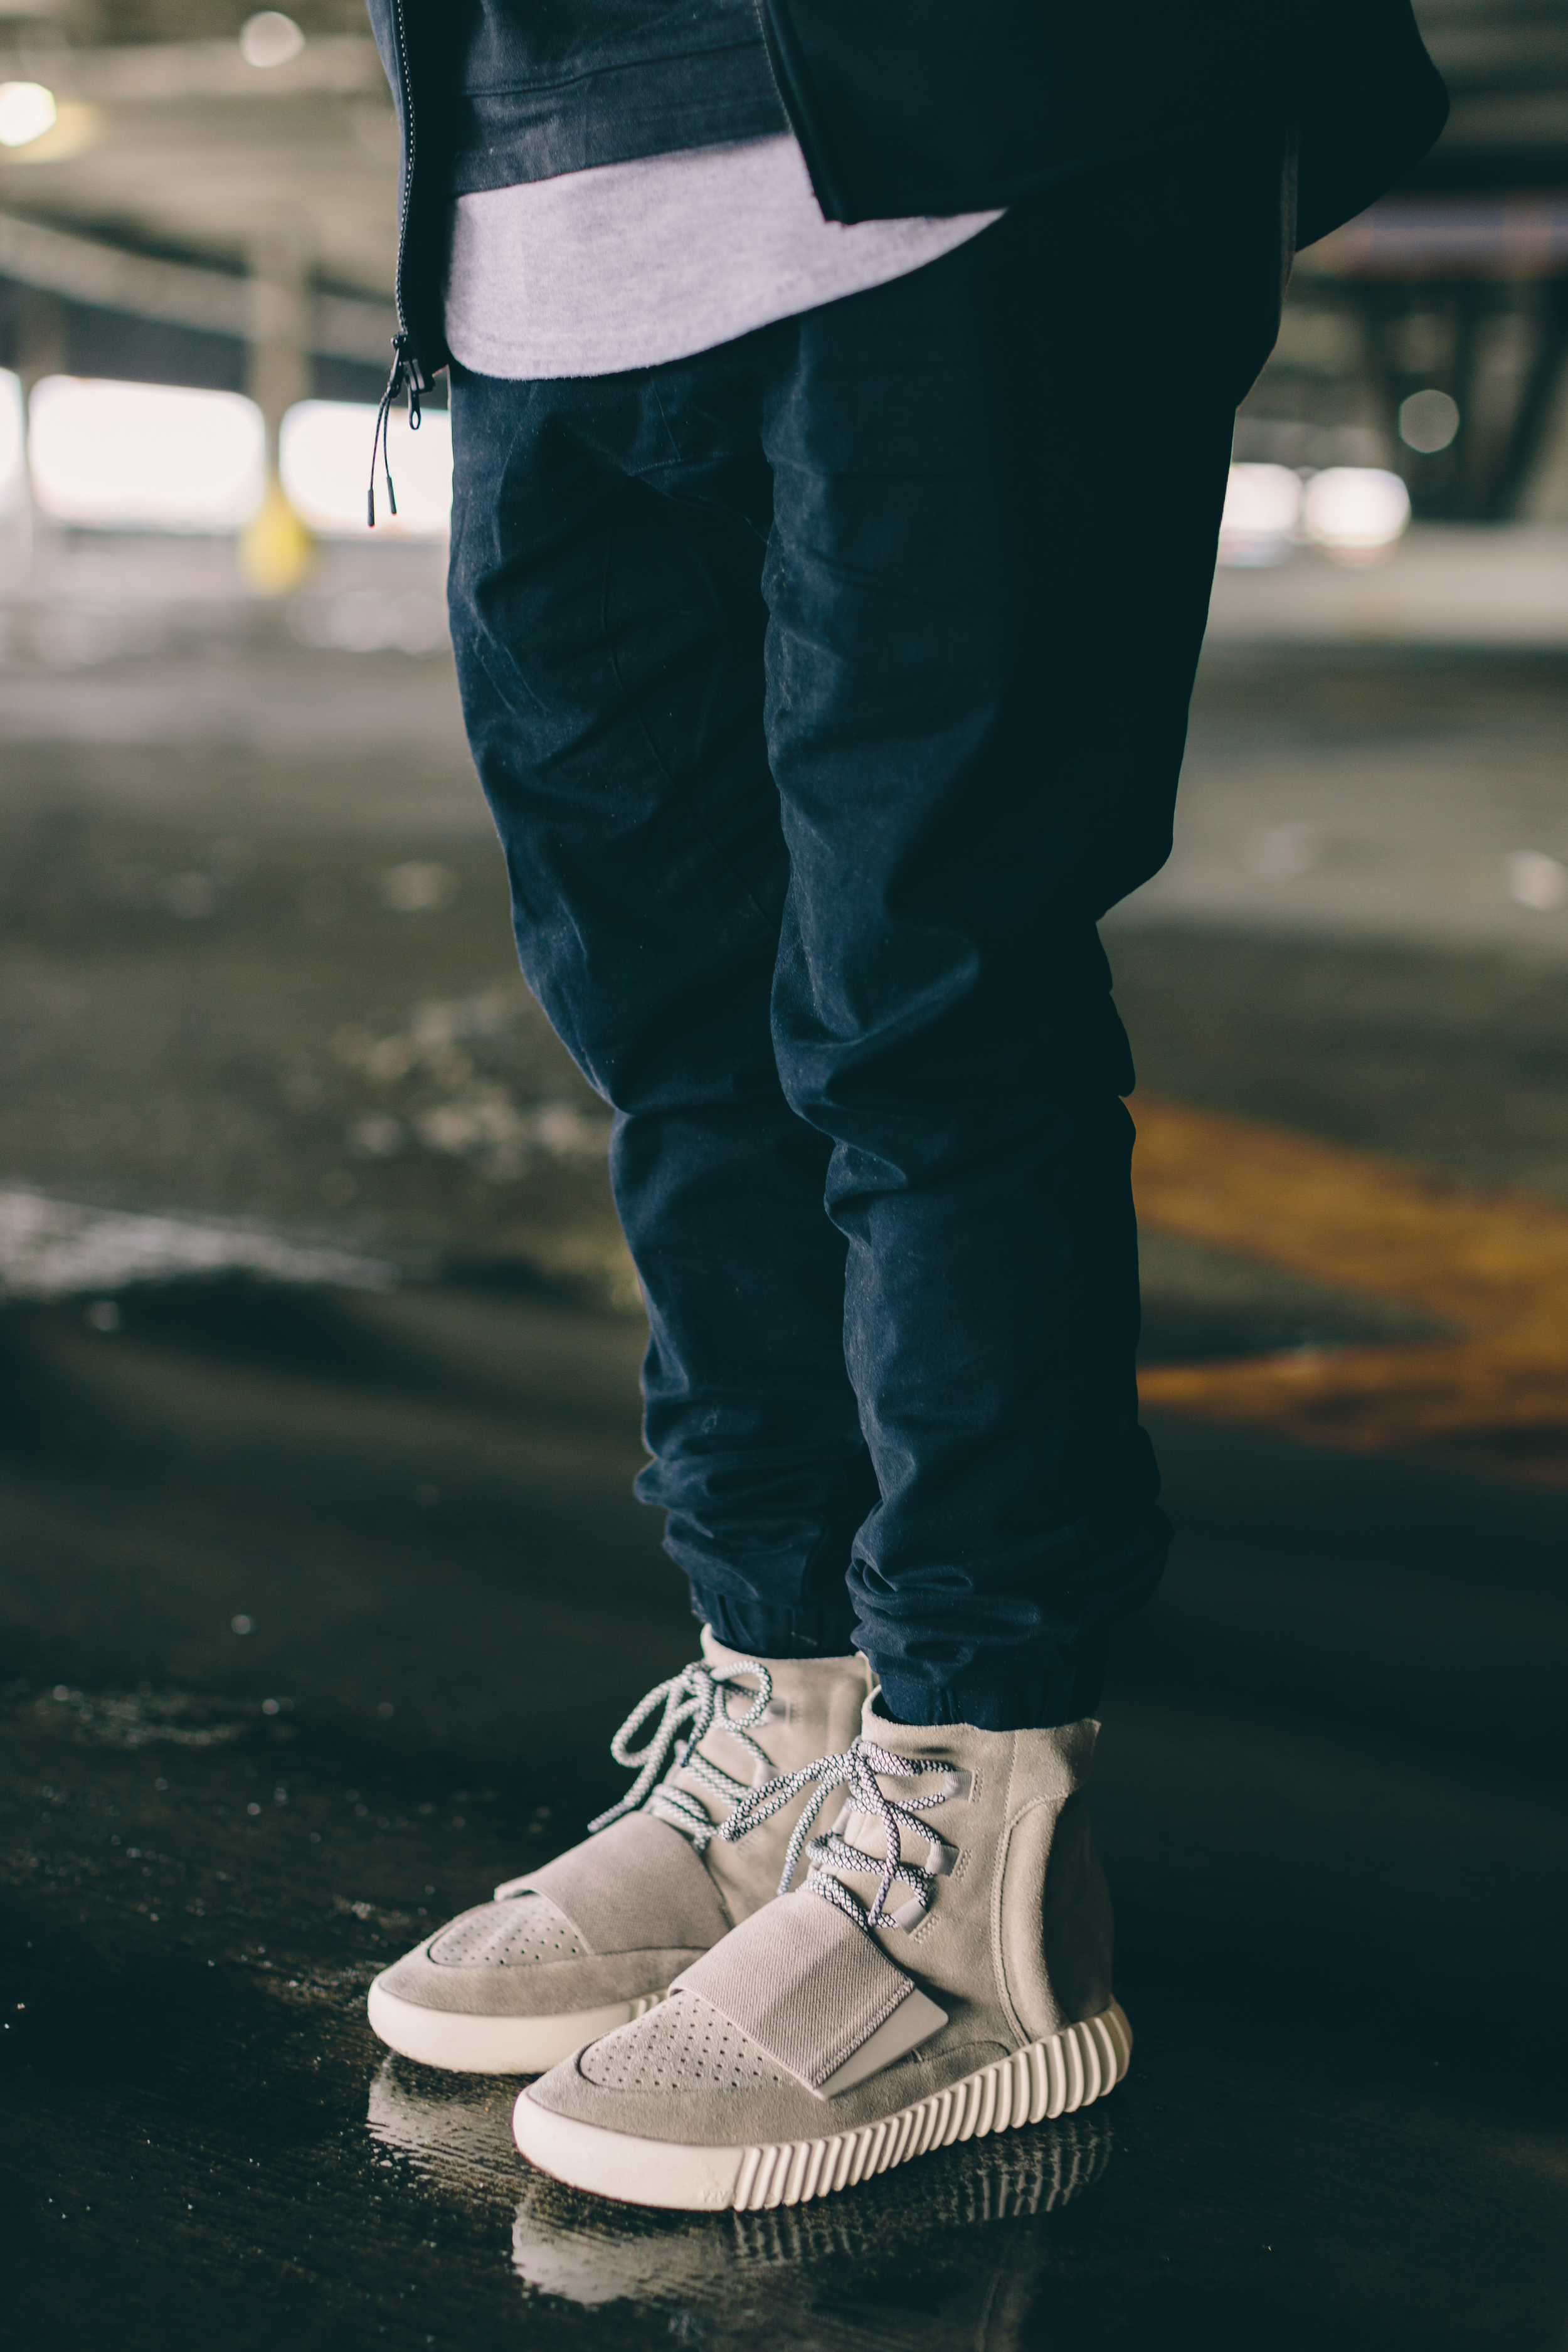 adidas yeezy 750 boost original